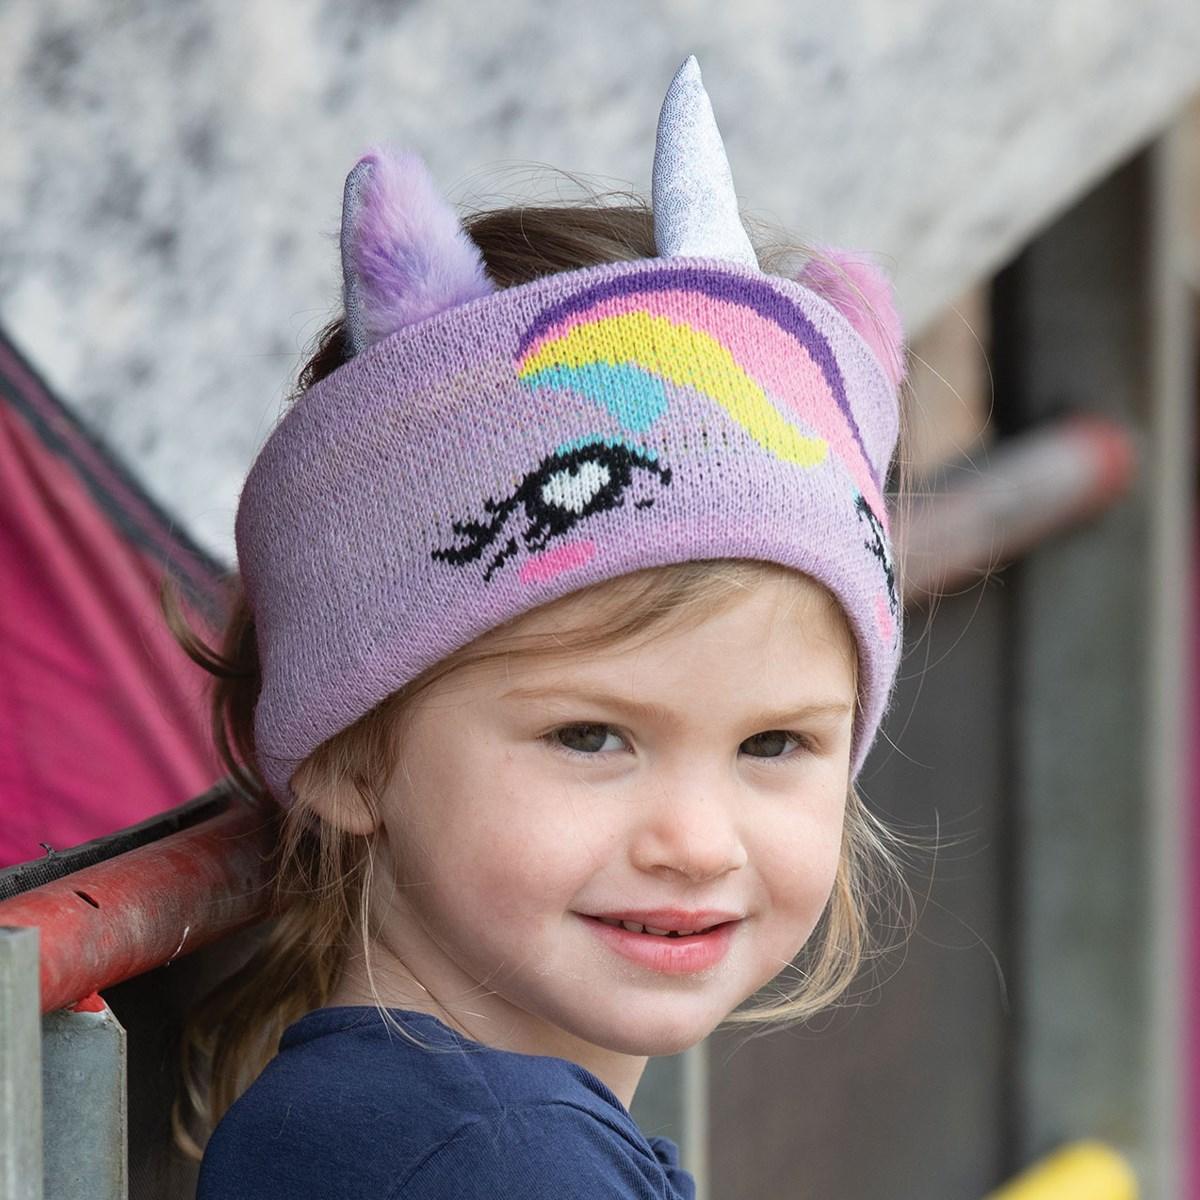 Equetech Twilight Childs Unicorn Knit Lilac Headband